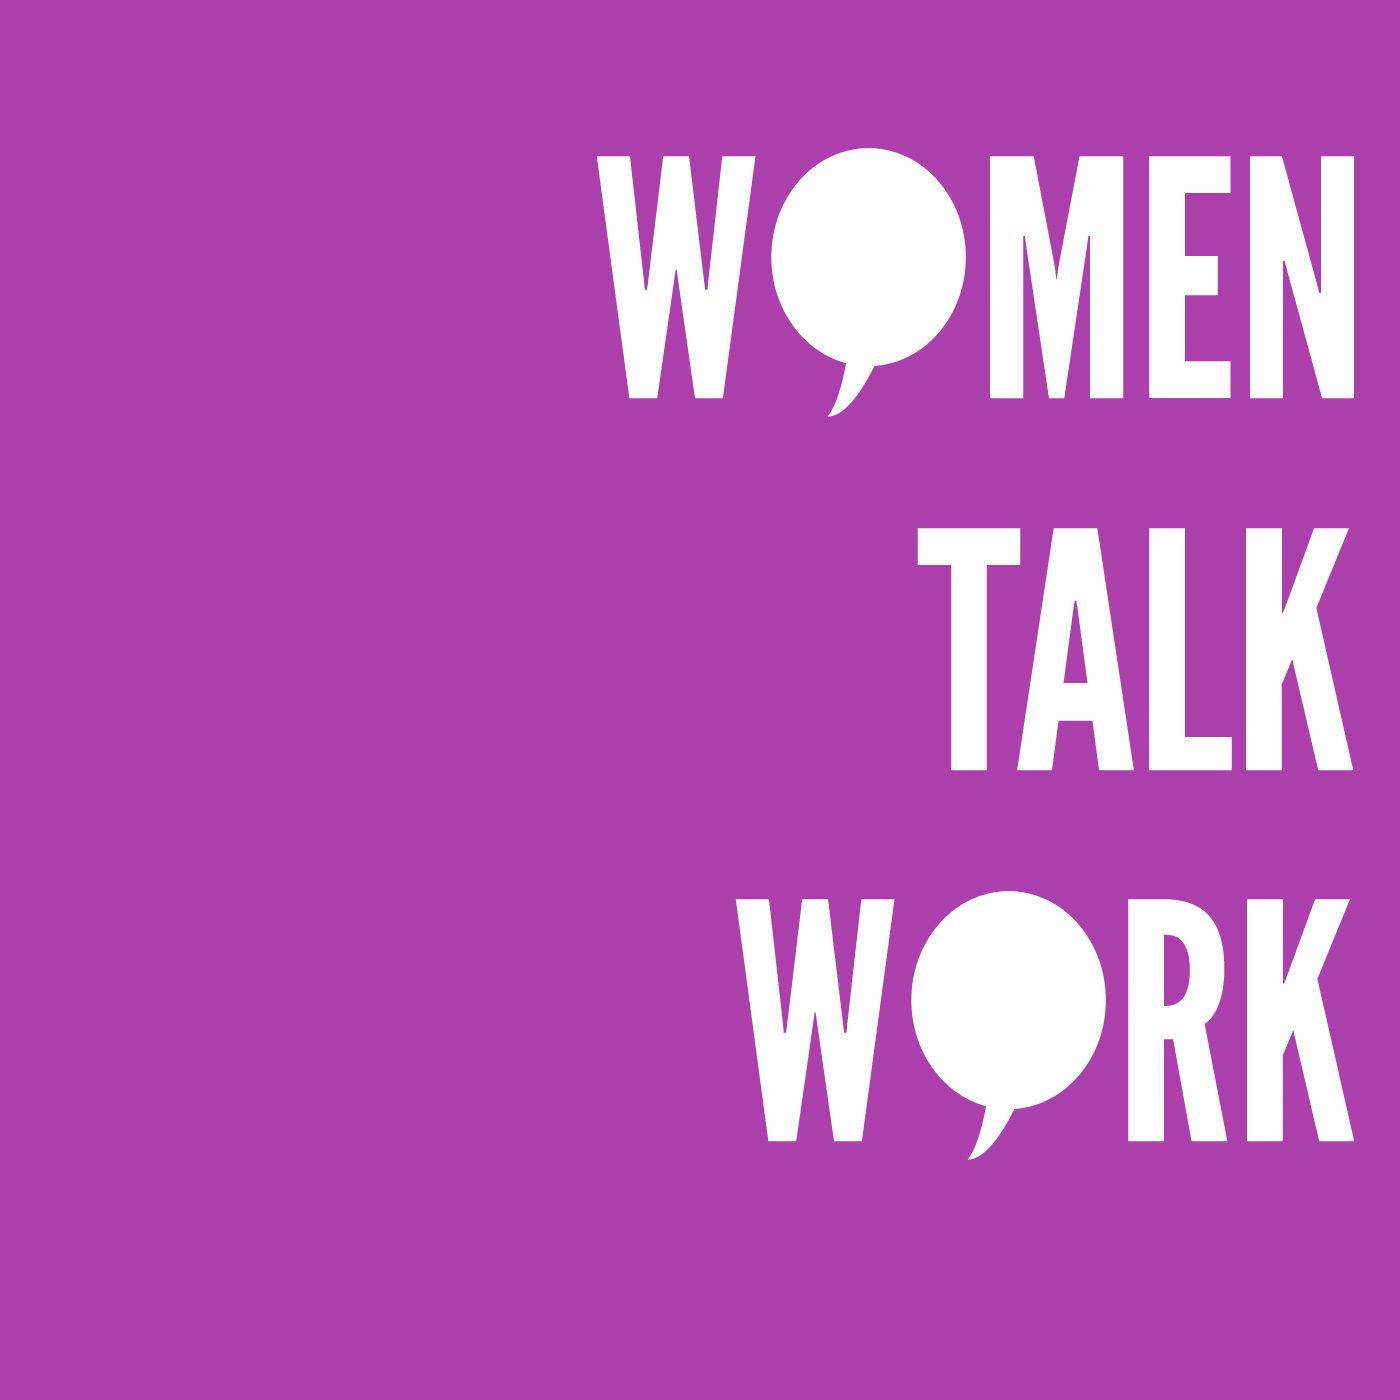 Women Talk Work